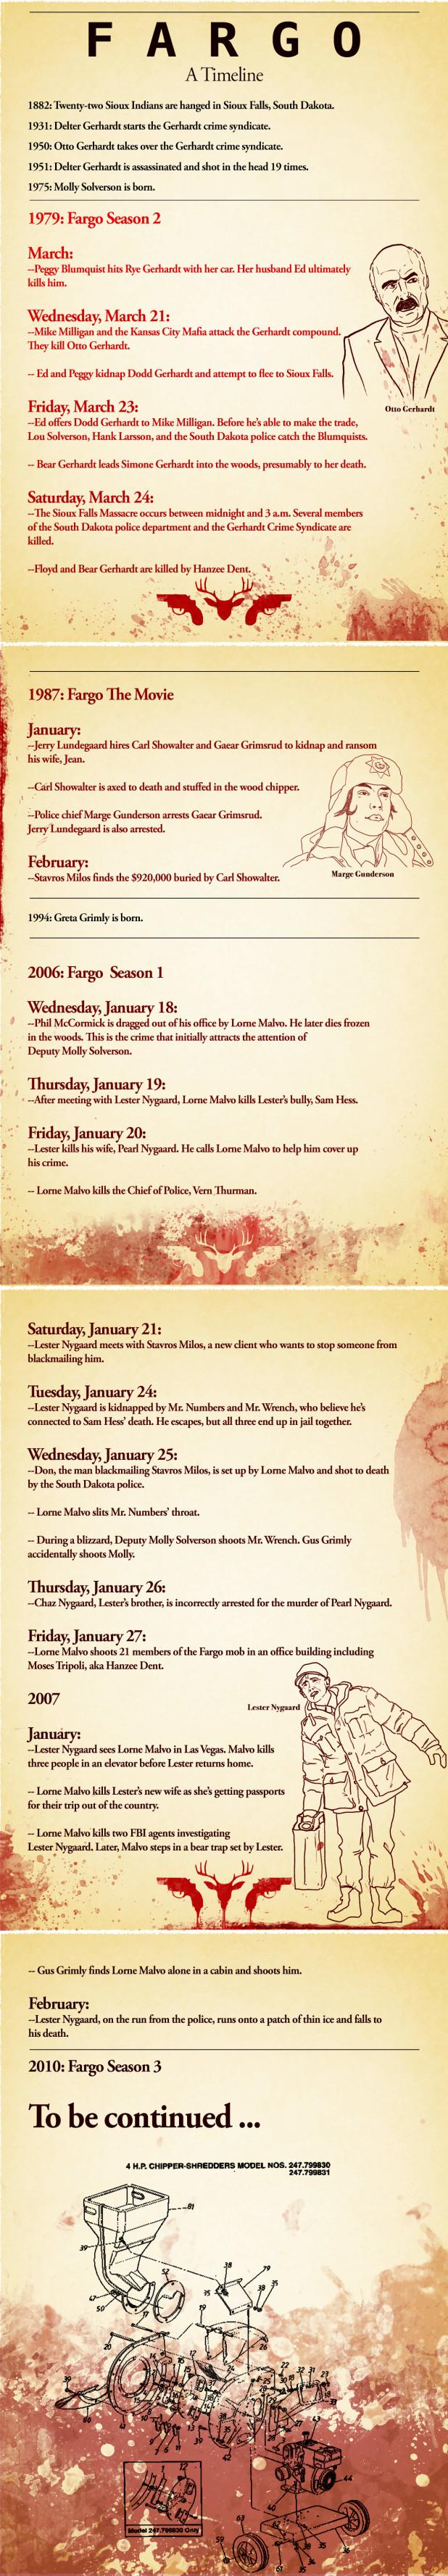 The Ultimate 'Fargo' Timeline Decider Where To Stream